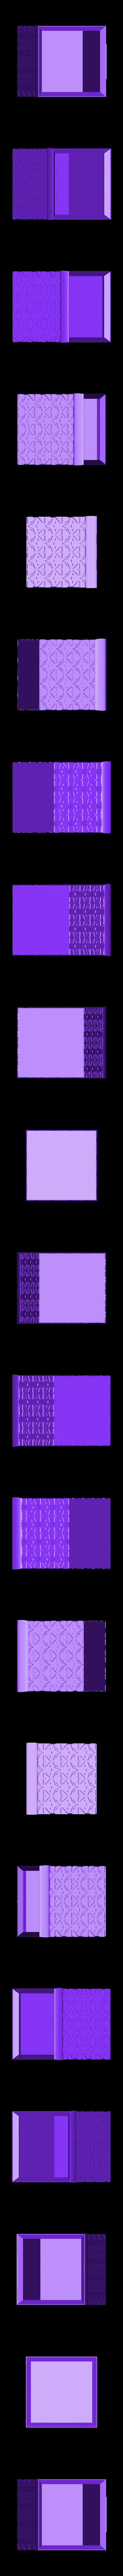 GiftBox_medium_geometric_bottom.STL Download free STL file Gift Box - Medium • 3D printer model, DDDeco